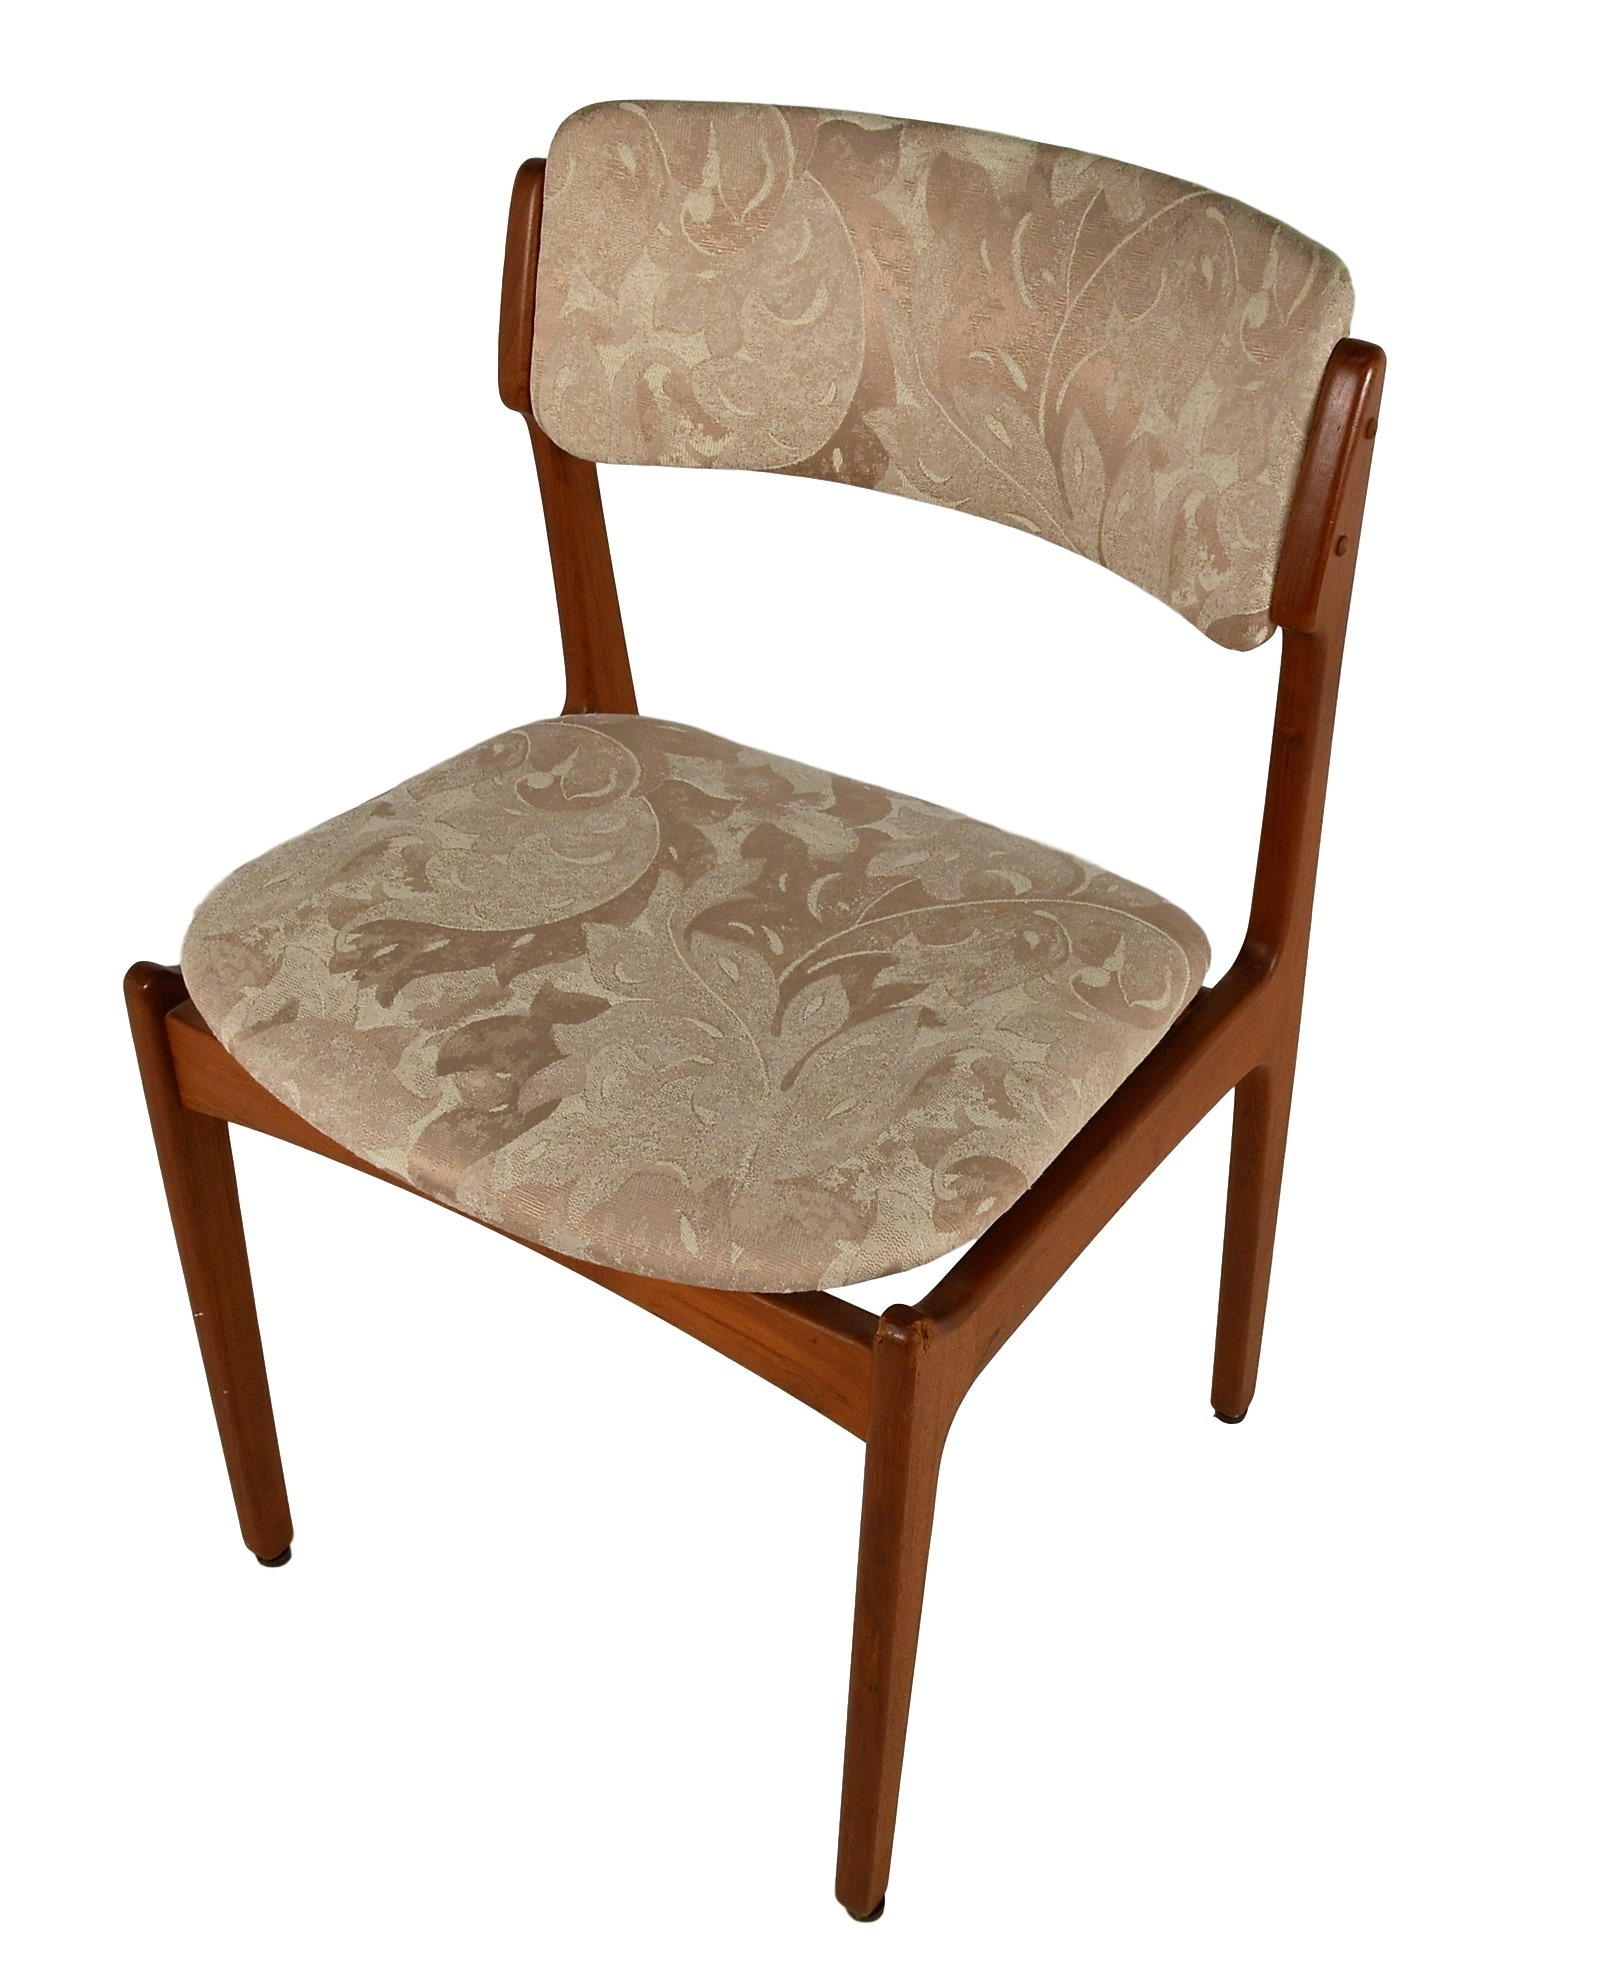 erik buck chairs ergonomic chair and ottoman set of 6 teak dining